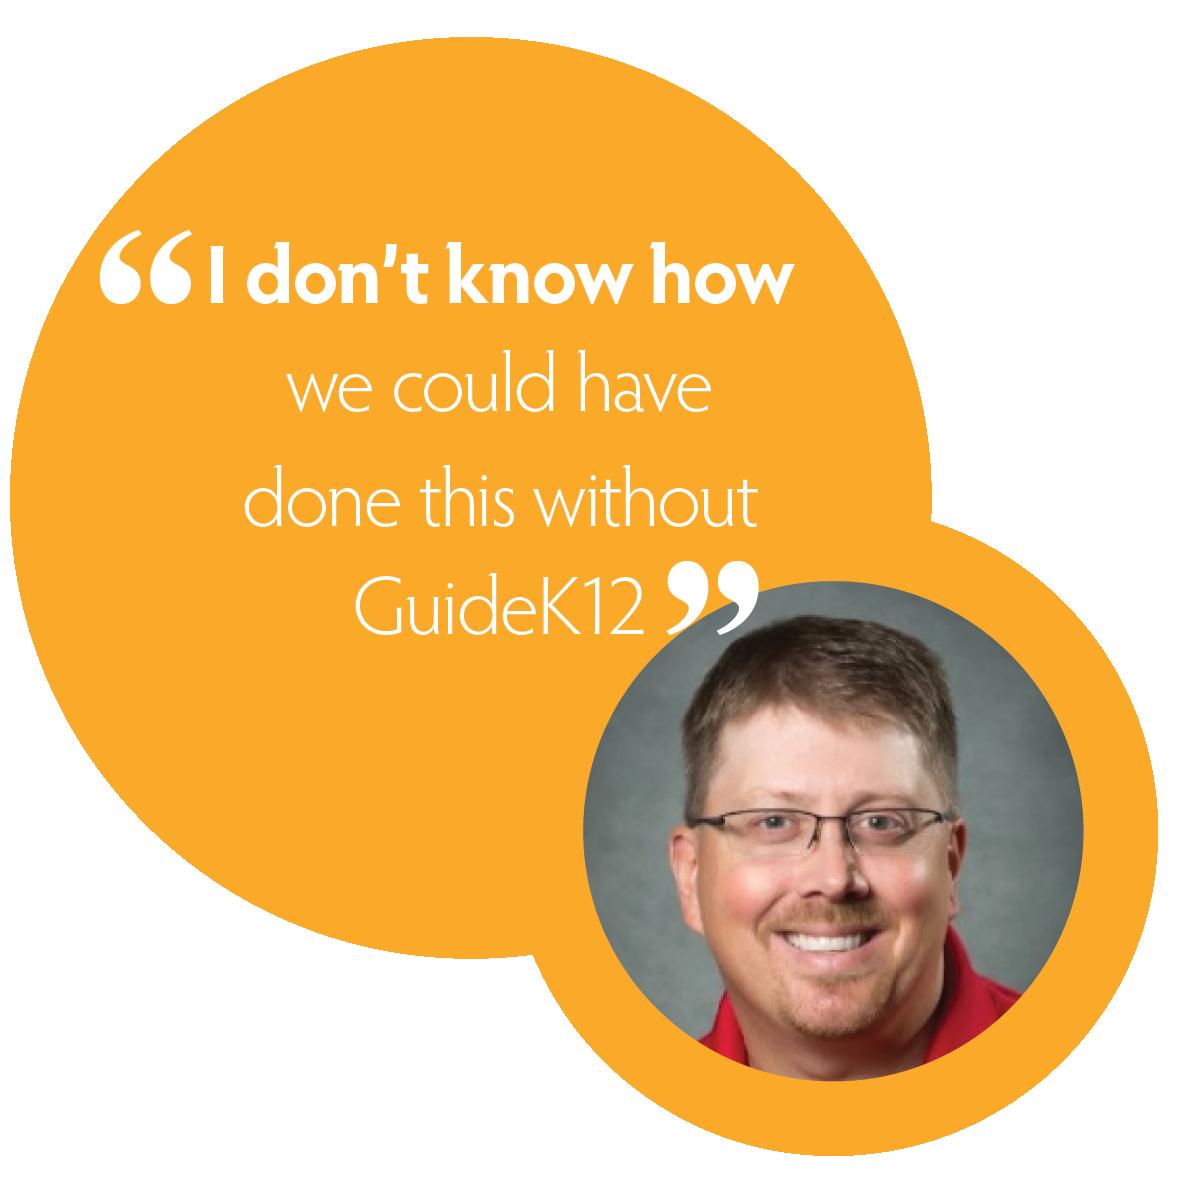 Gk12 - Mark Finstrom Quote